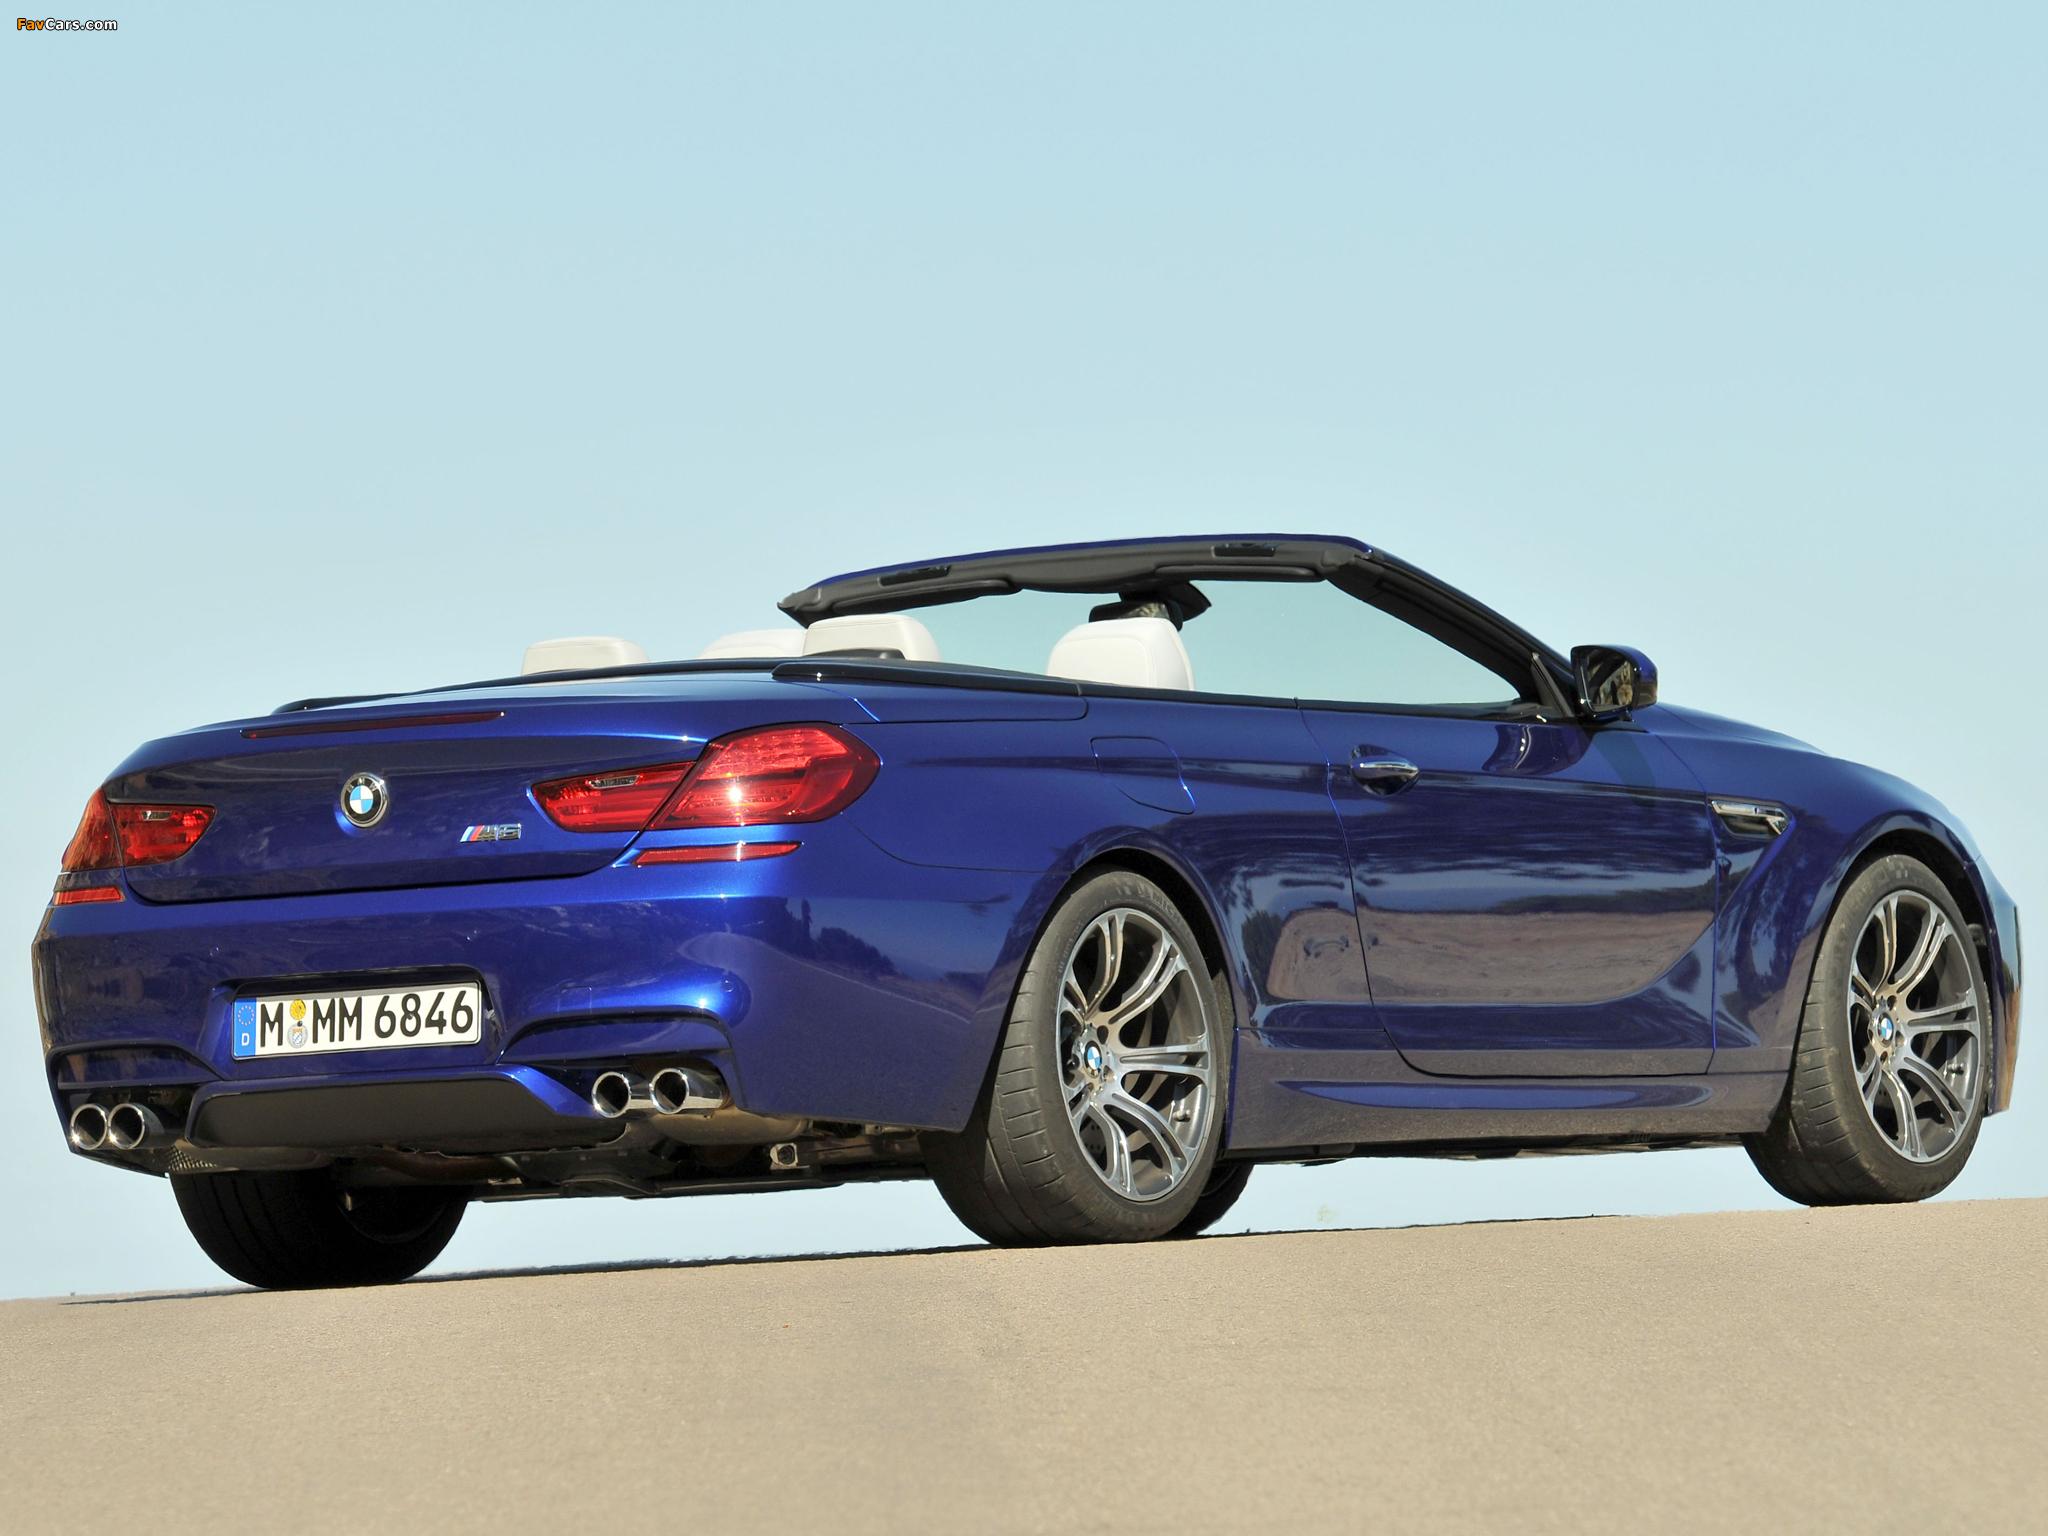 BMW M6 Cabrio (F12) 2012 pictures (2048 x 1536)